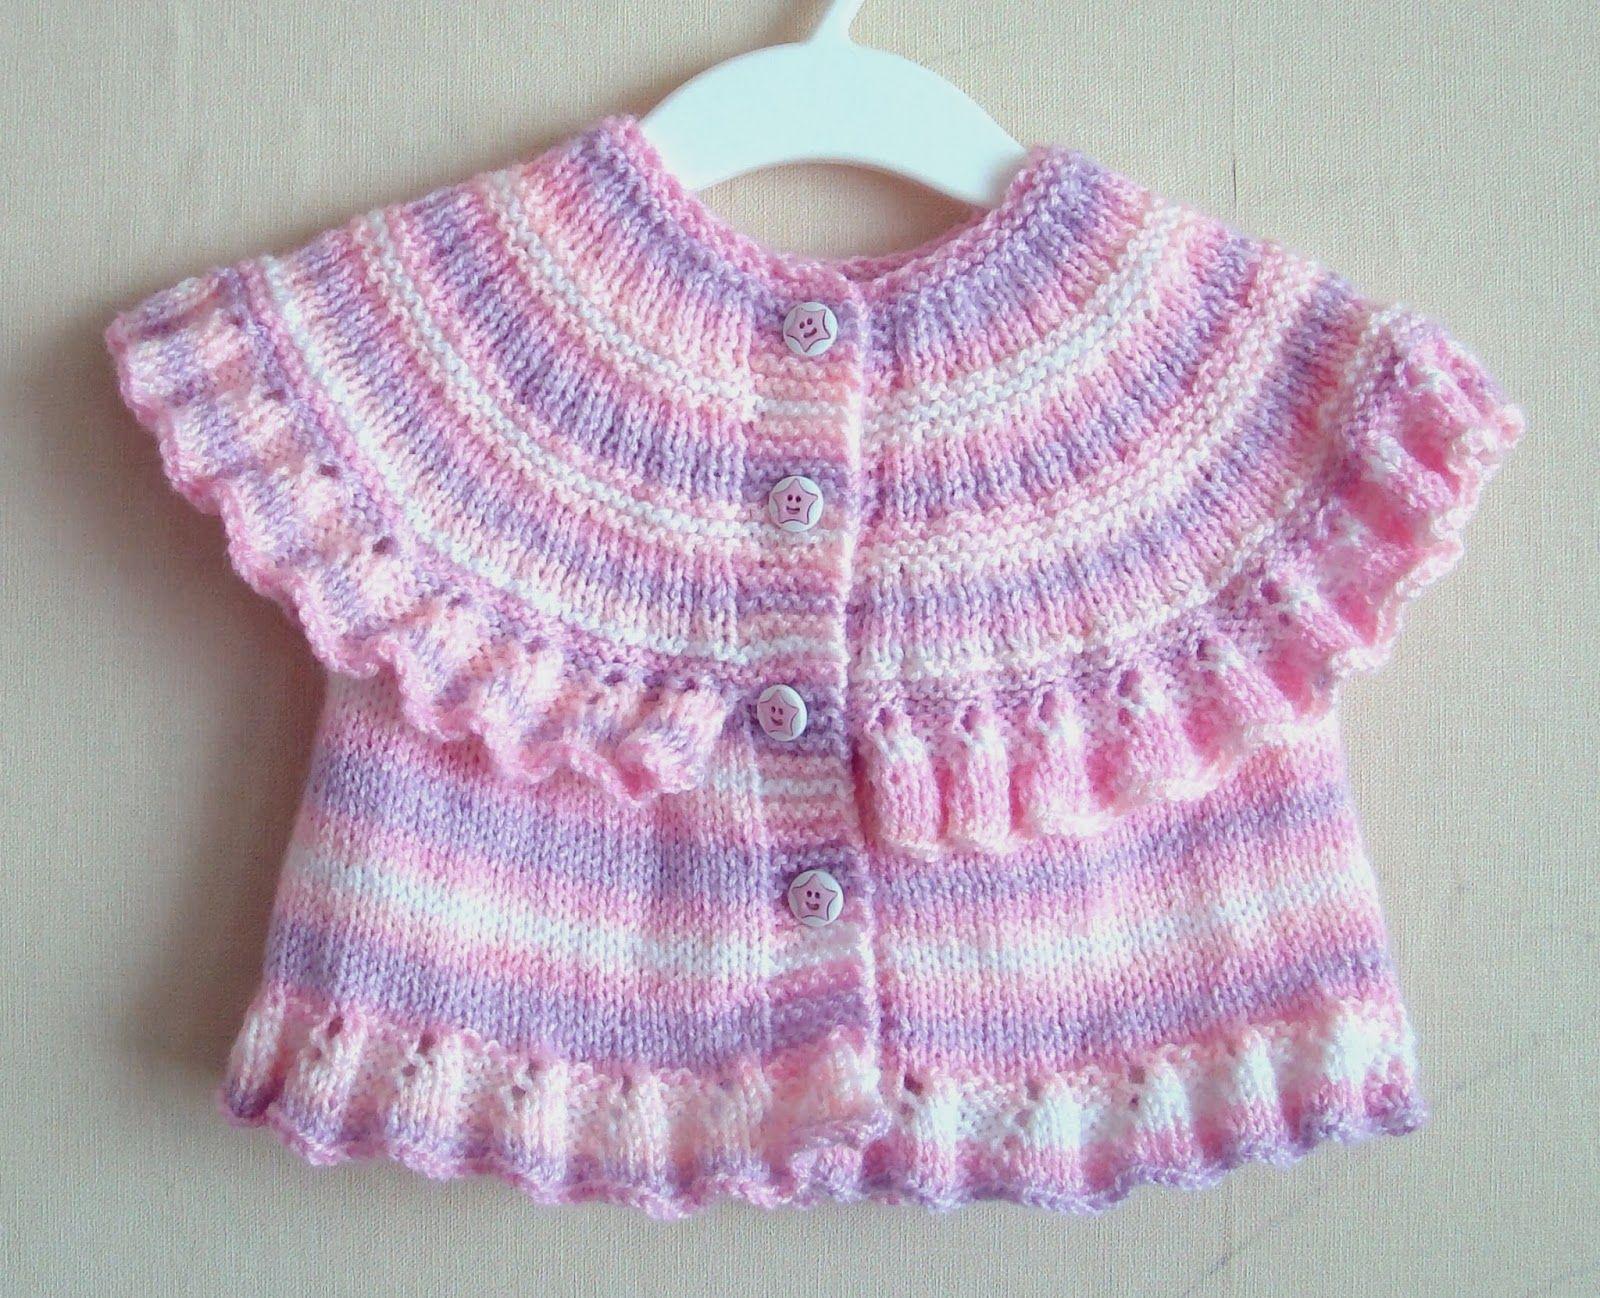 Knitting Pattern for Ruffle Baby Vest ~ Pure Craft | Knitting ...